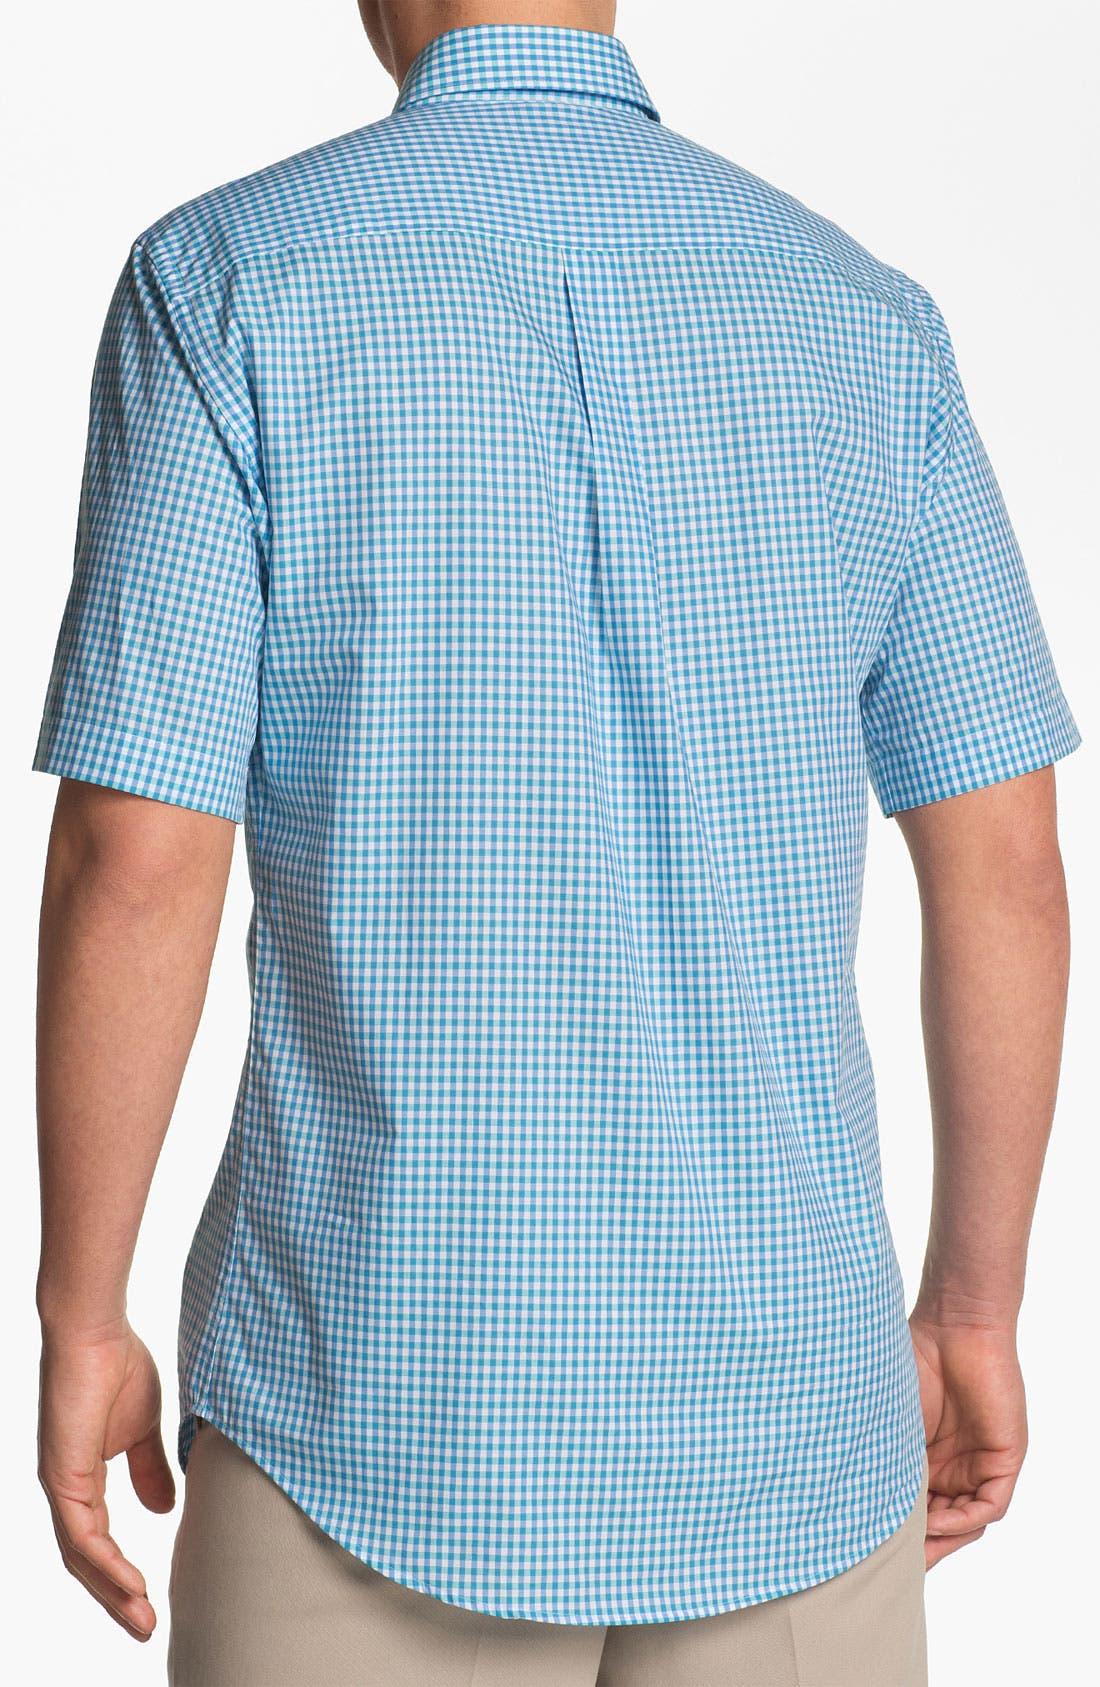 Alternate Image 2  - Peter Millar Regular Fit Short Sleeve Sport Shirt